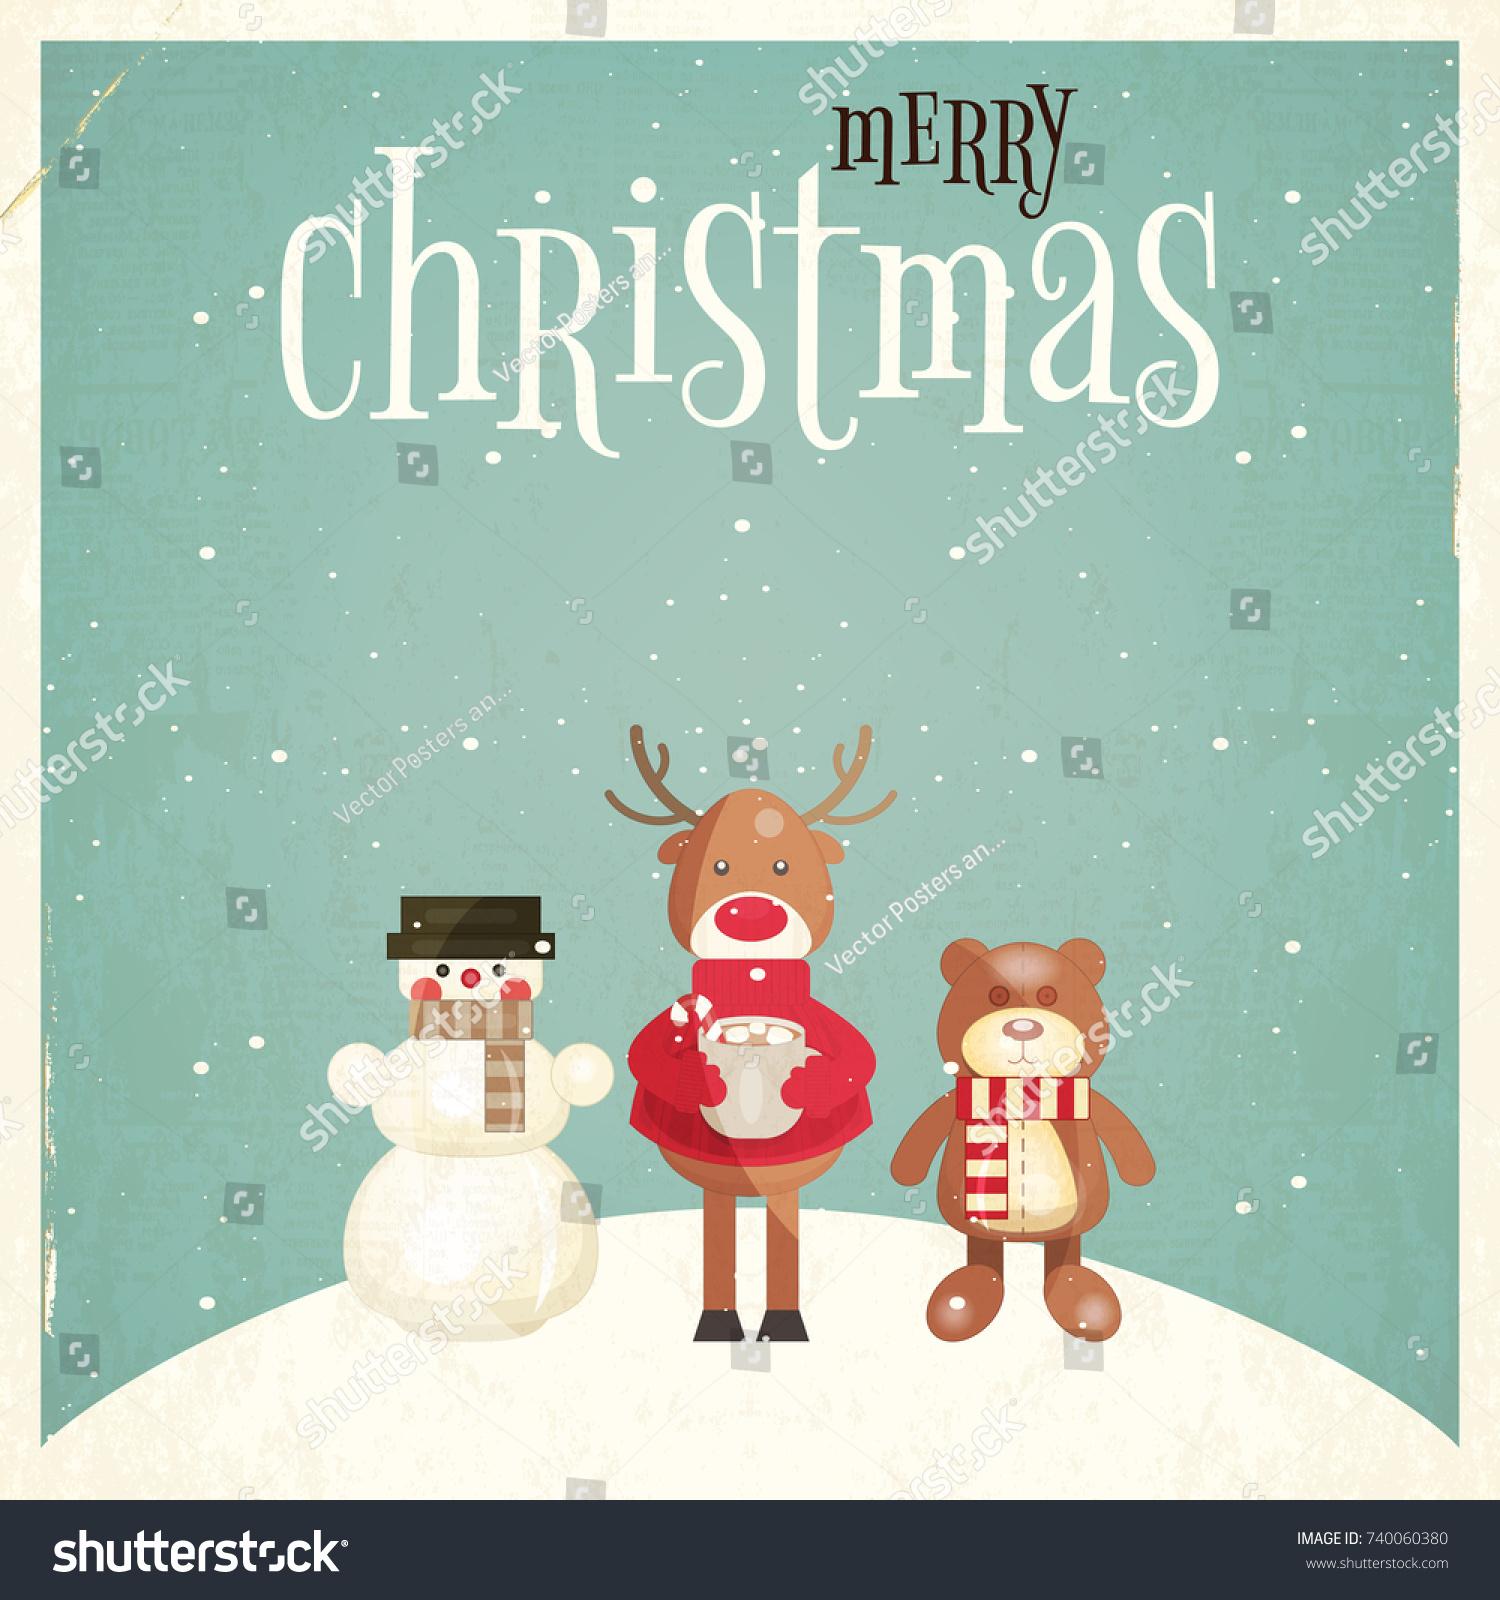 Merry christmas greeting card xmas characters stock vector 740060380 merry christmas greeting card with xmas characters snowman deer bear vector illustration kristyandbryce Gallery